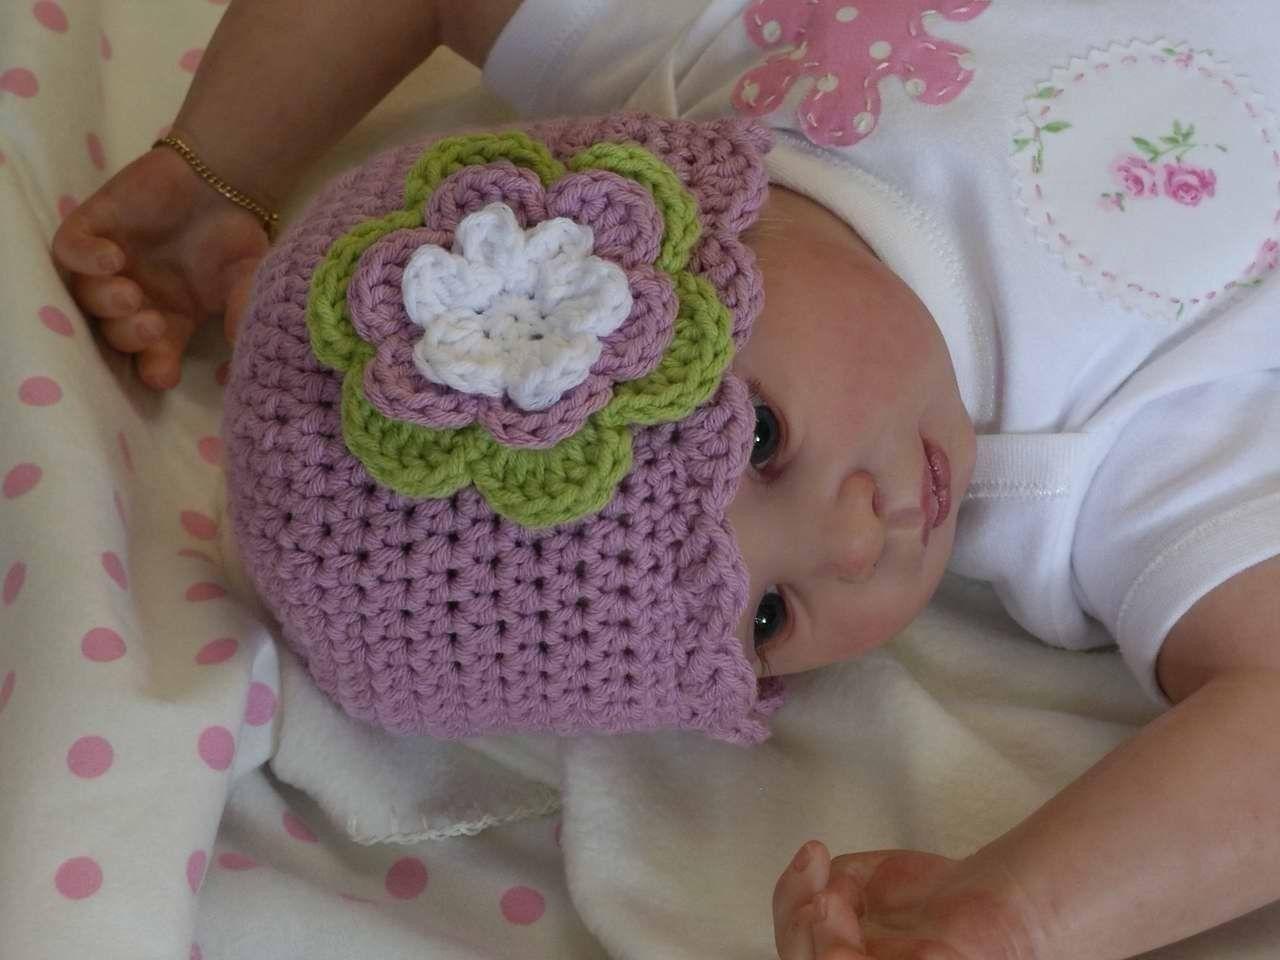 Crochet hat pattern easy peasy shell trim baby hat crochet pattern crochet hat pattern easy peasy shell trim baby hat crochet pattern no103 eight dt1010fo